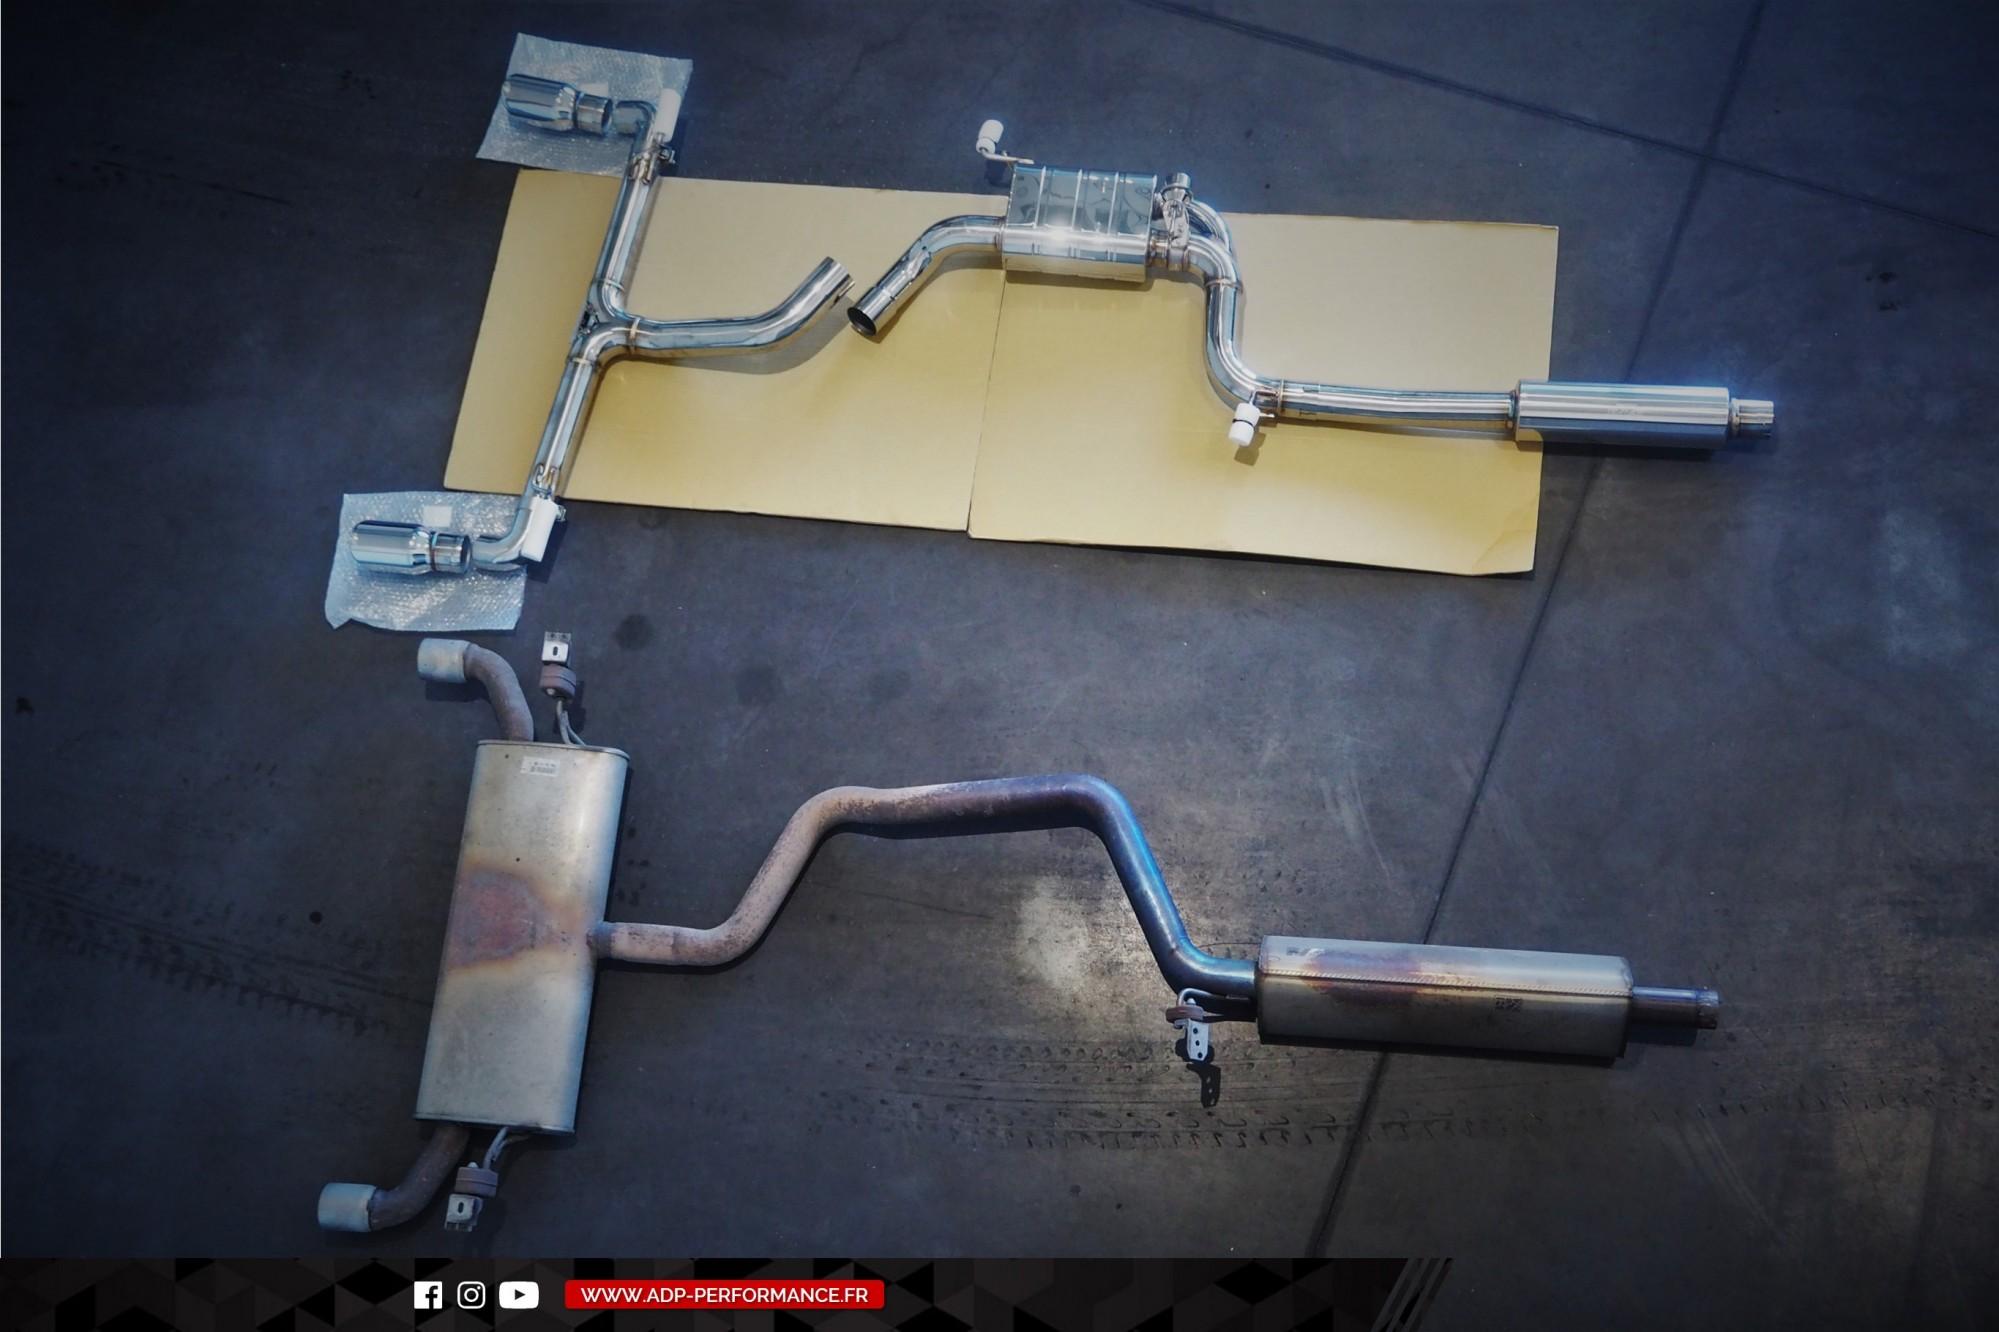 Ligne d'échappement iPE Innotech St Martin de Crau - VW Golf 7 GTI Performance 2.0 TSI 230cv - ADP Performance